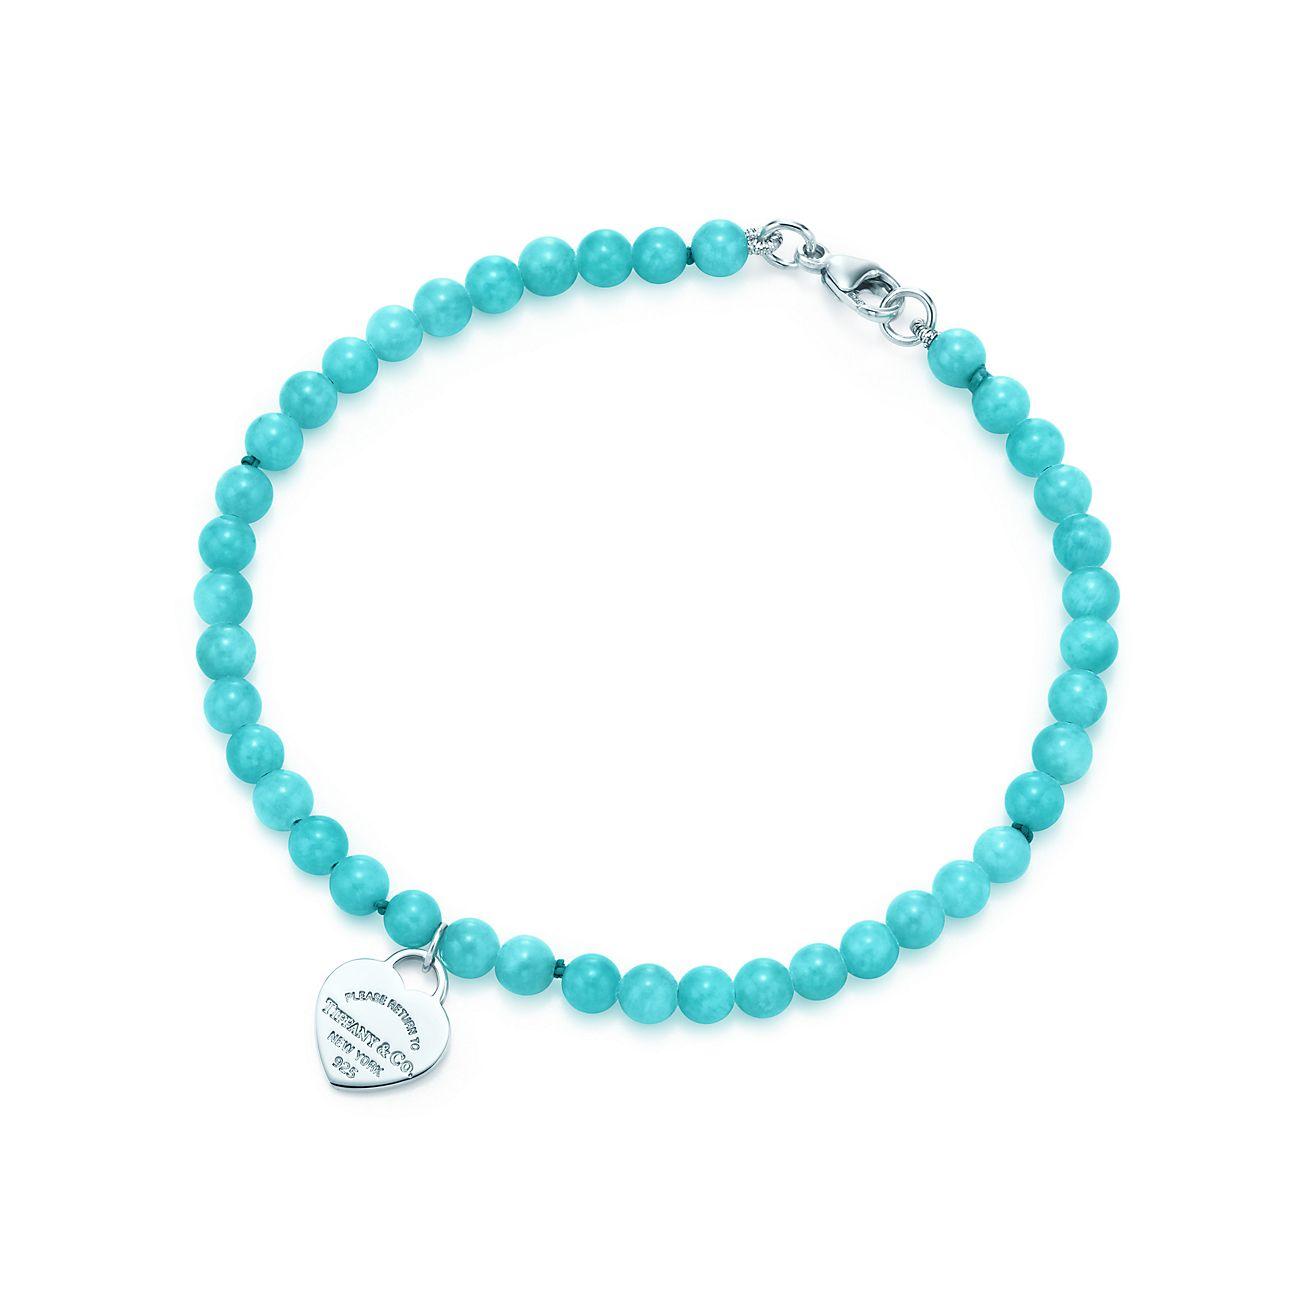 Return to tiffany mini heart tag in silver on an amazonite bead return to tiffanybead bracelet aloadofball Gallery